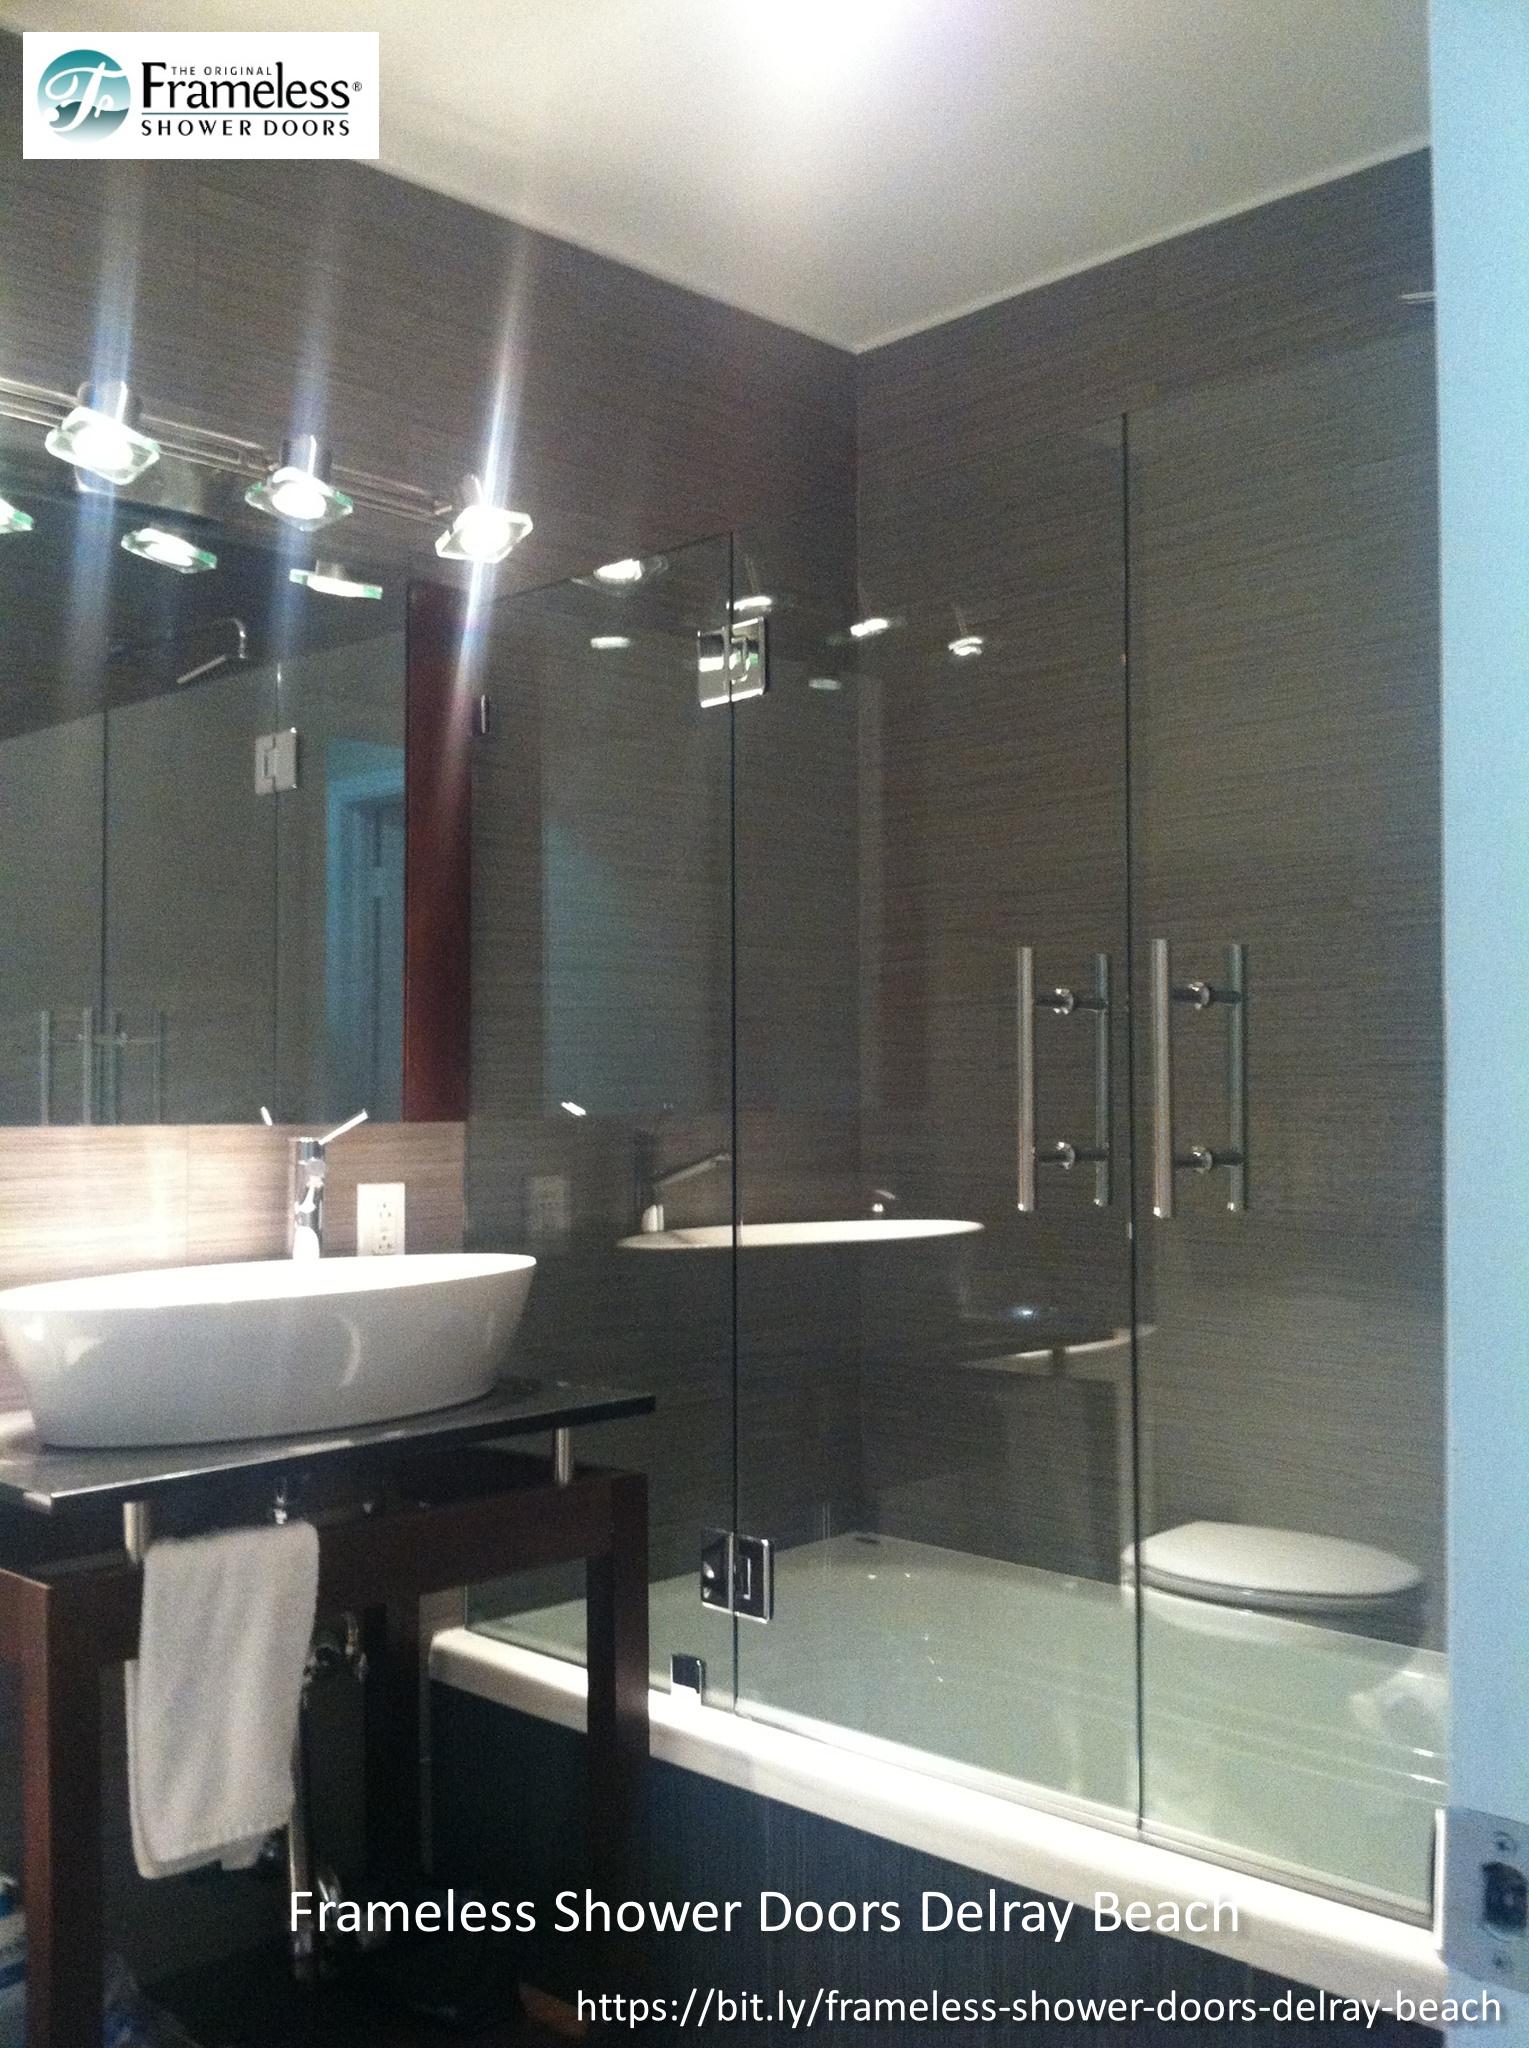 The Original Frameless Shower Doors Outline the Signs of a Damaged Shower Door